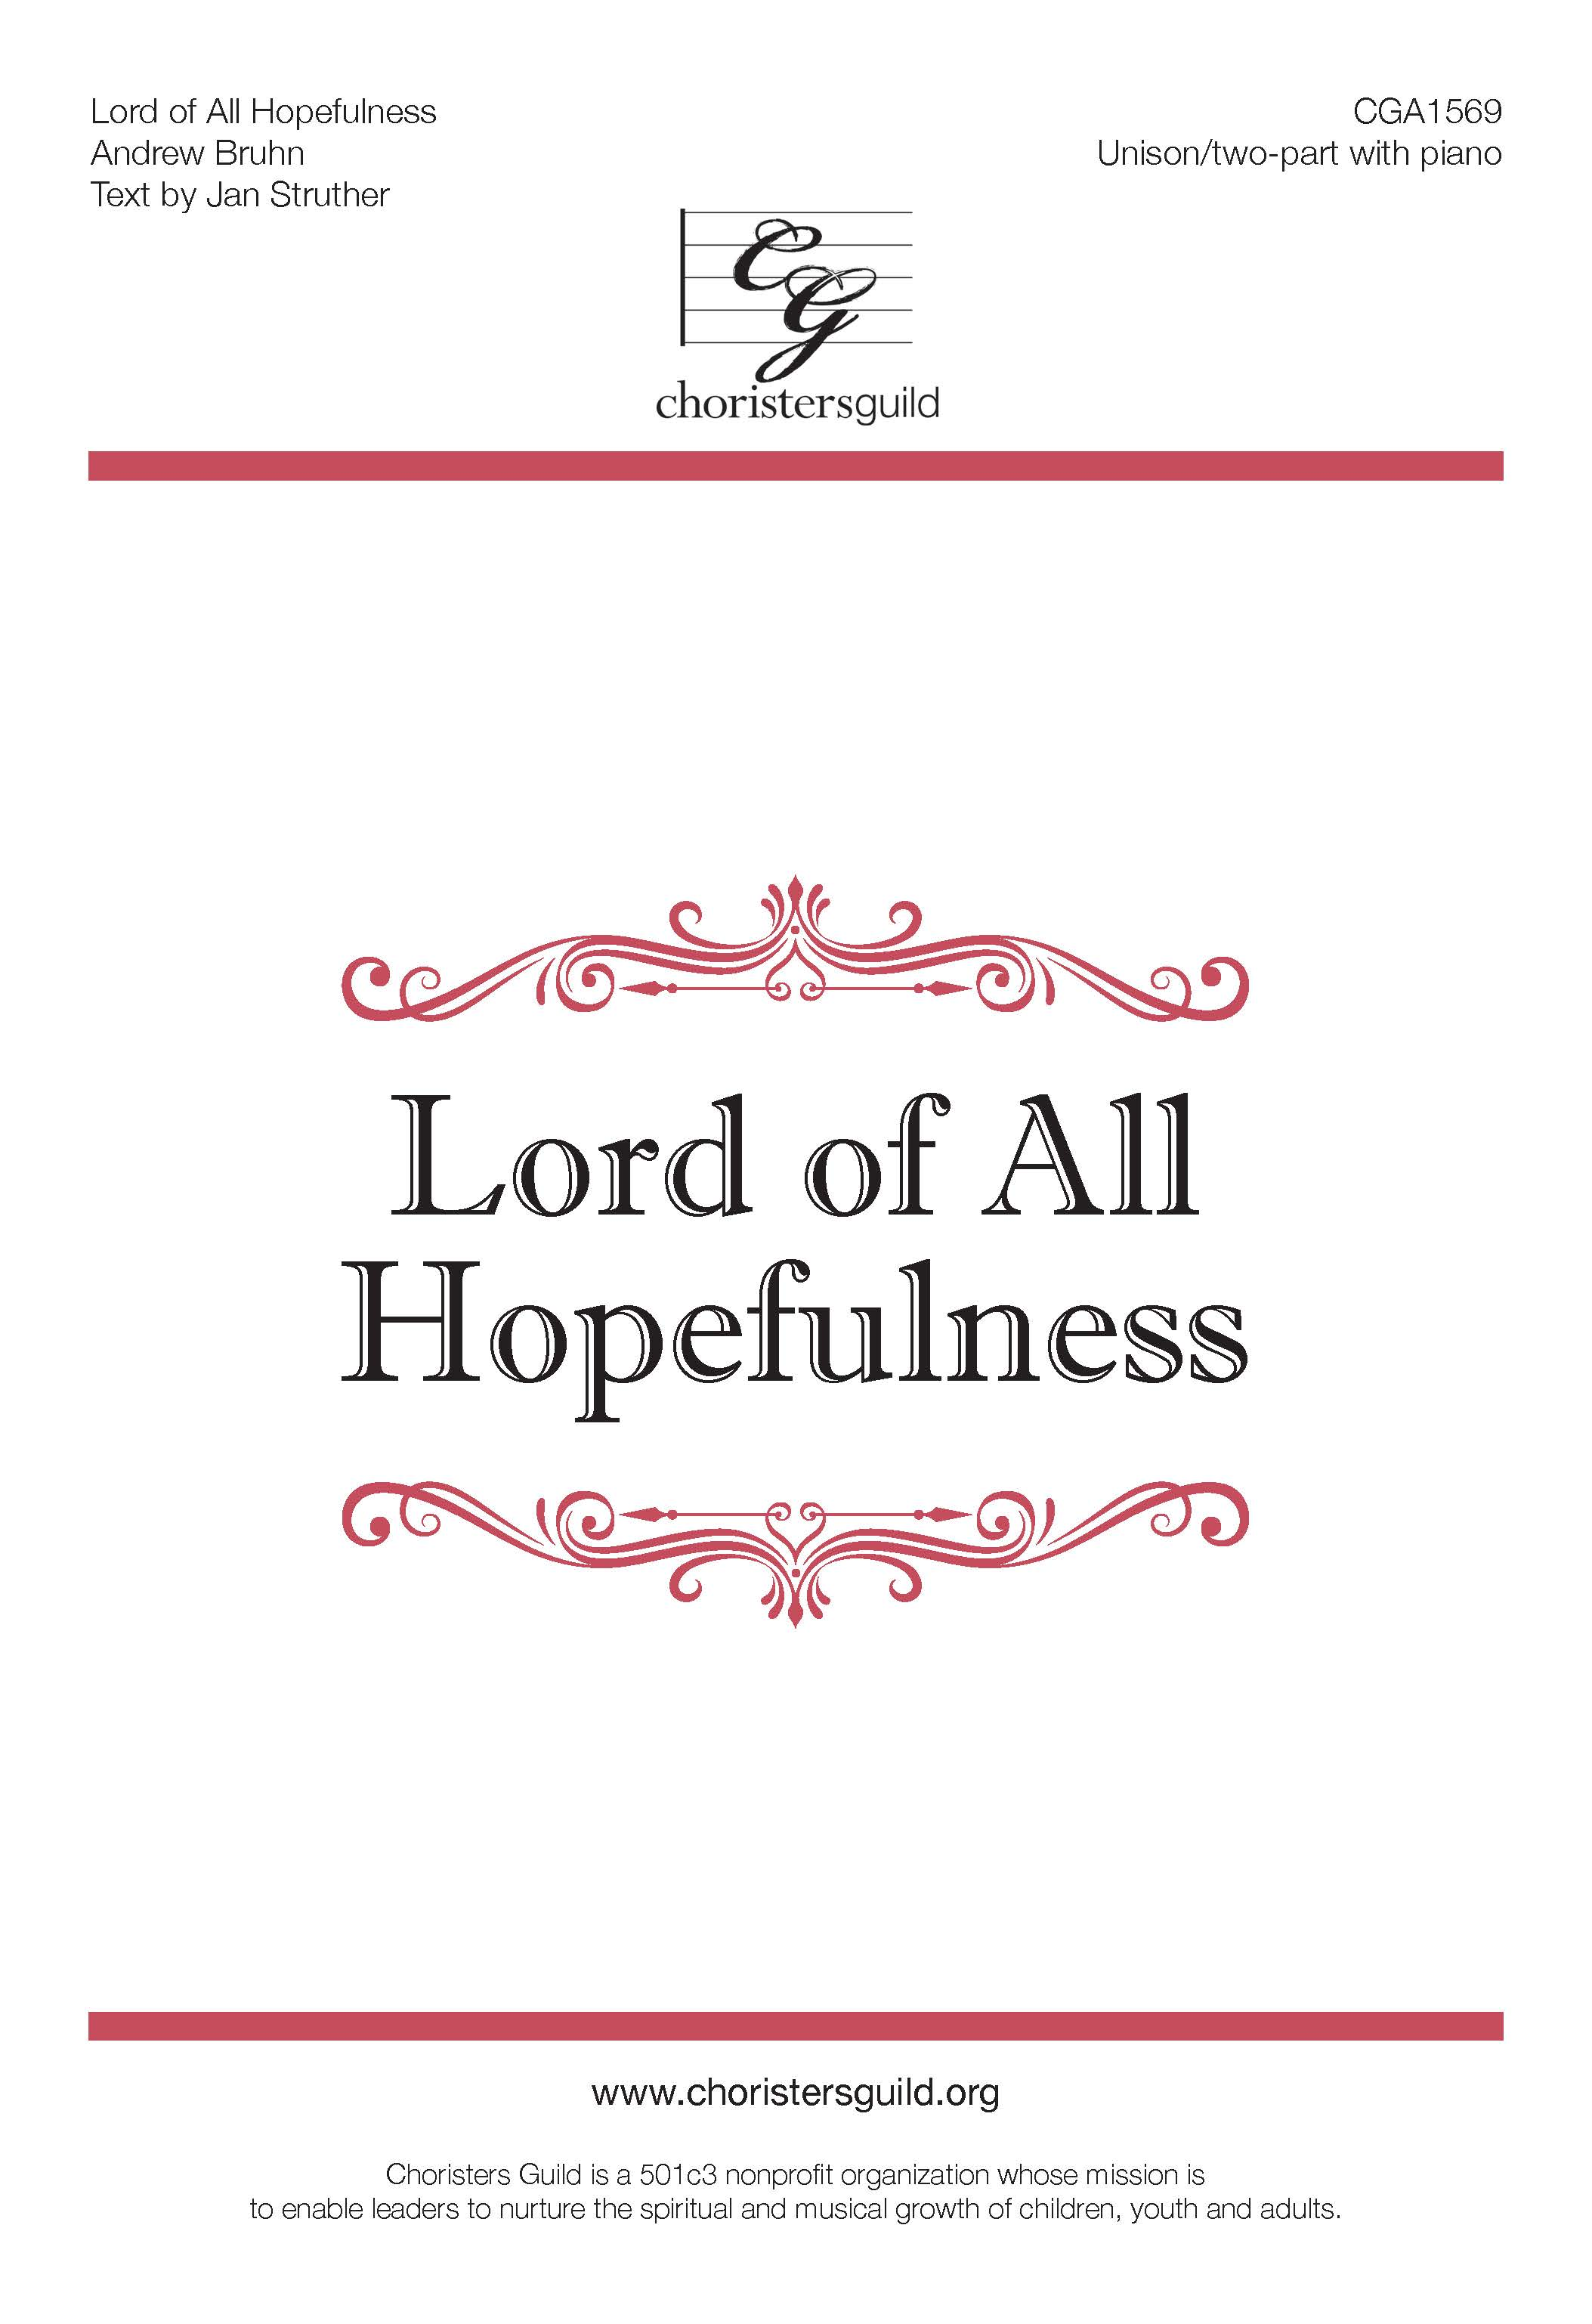 Lord of All Hopefulness